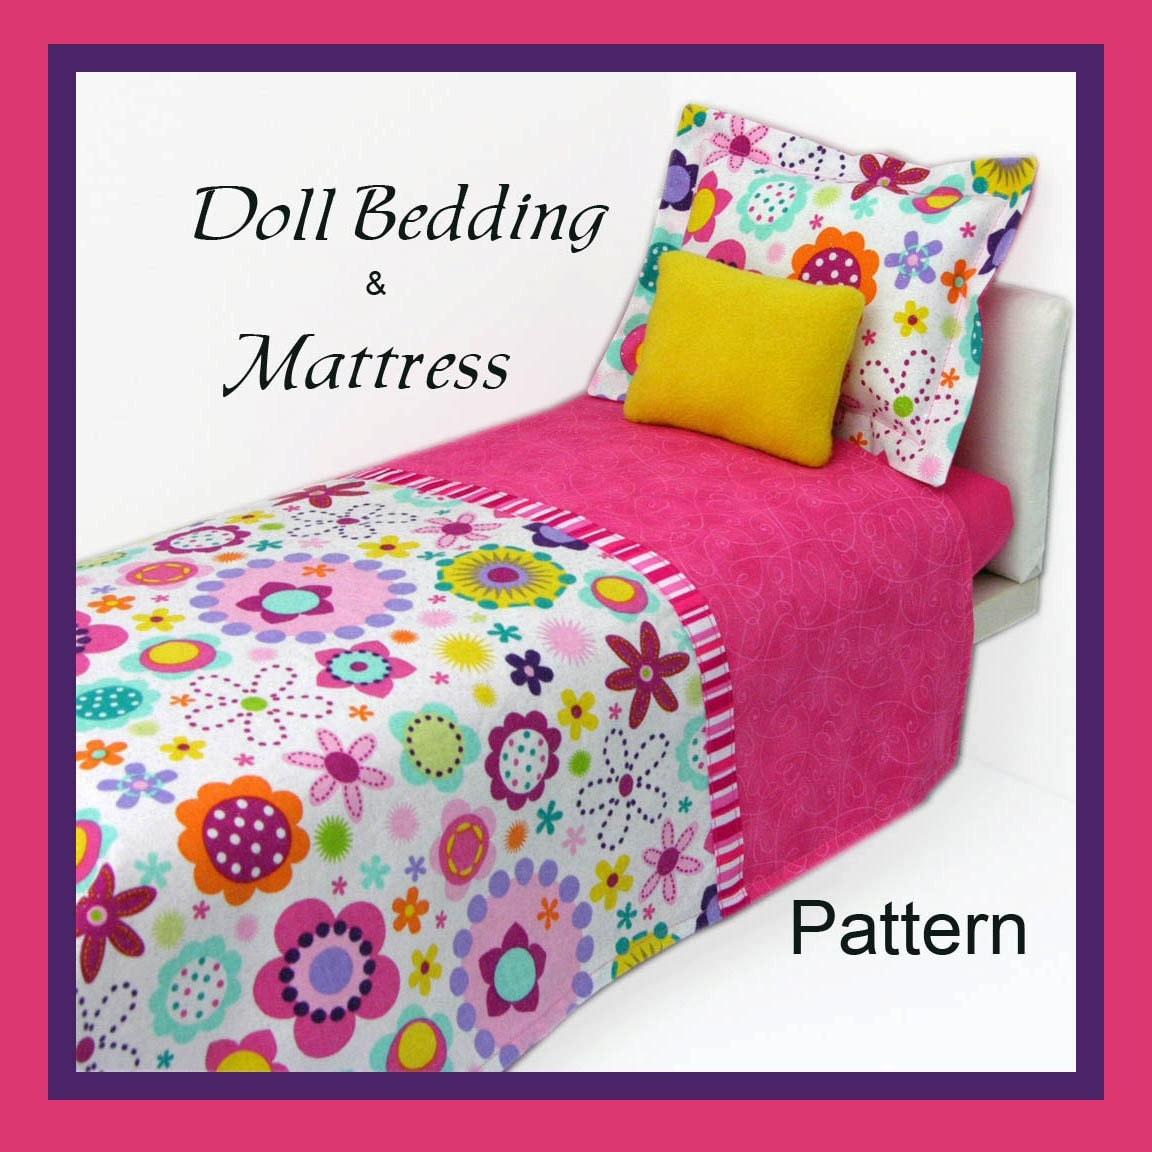 Doll Bed Mattress Pattern